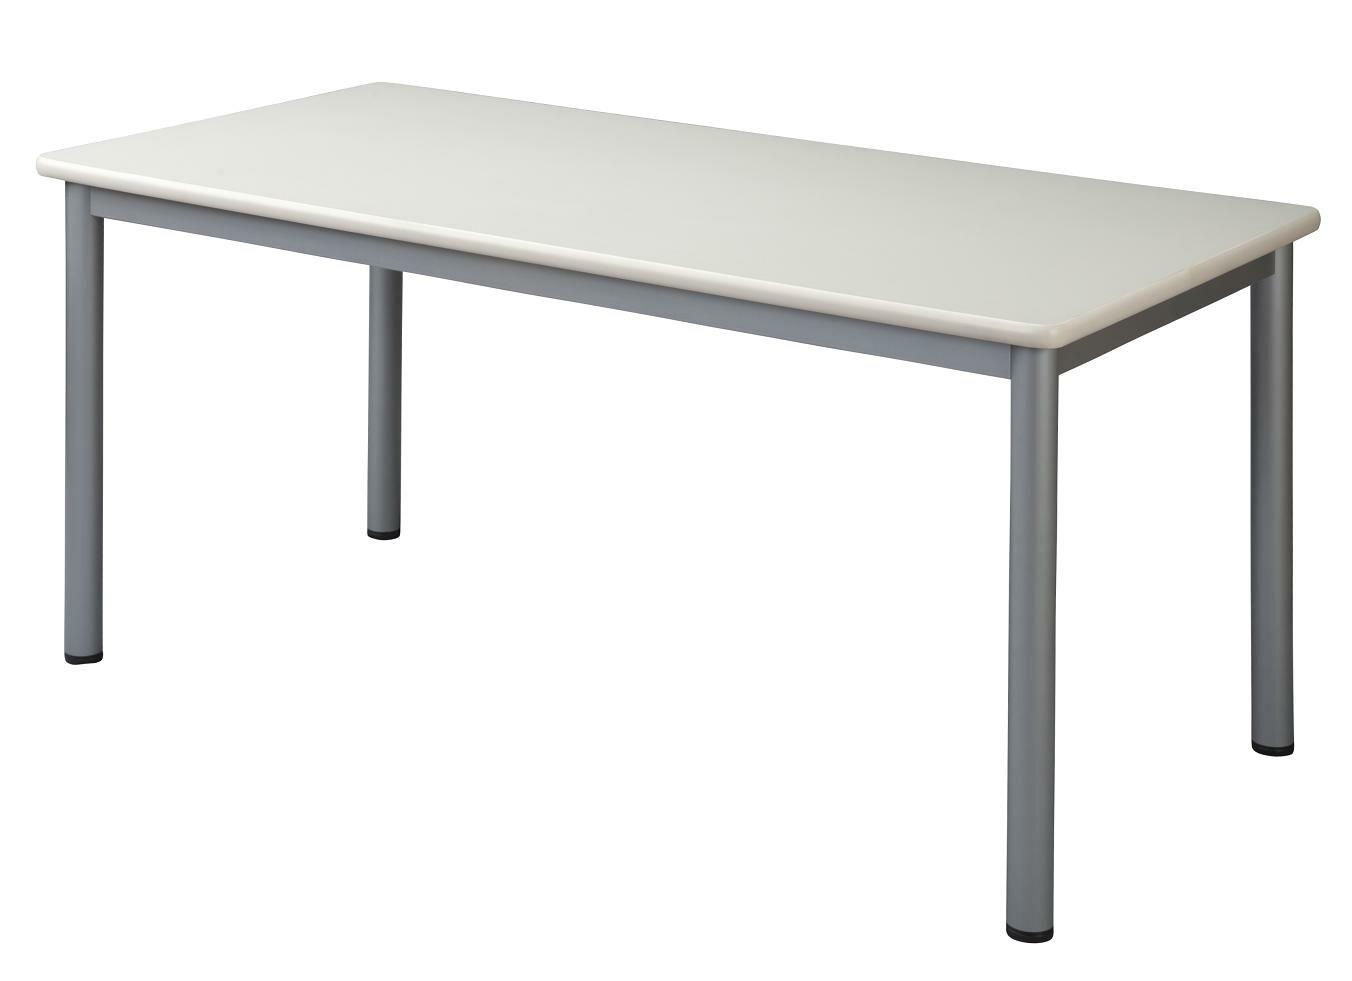 HITECHWOOD【ハイテクウッド】 ミーティングテーブル TL1590-NW ホワイト W1500xD900xH700mm